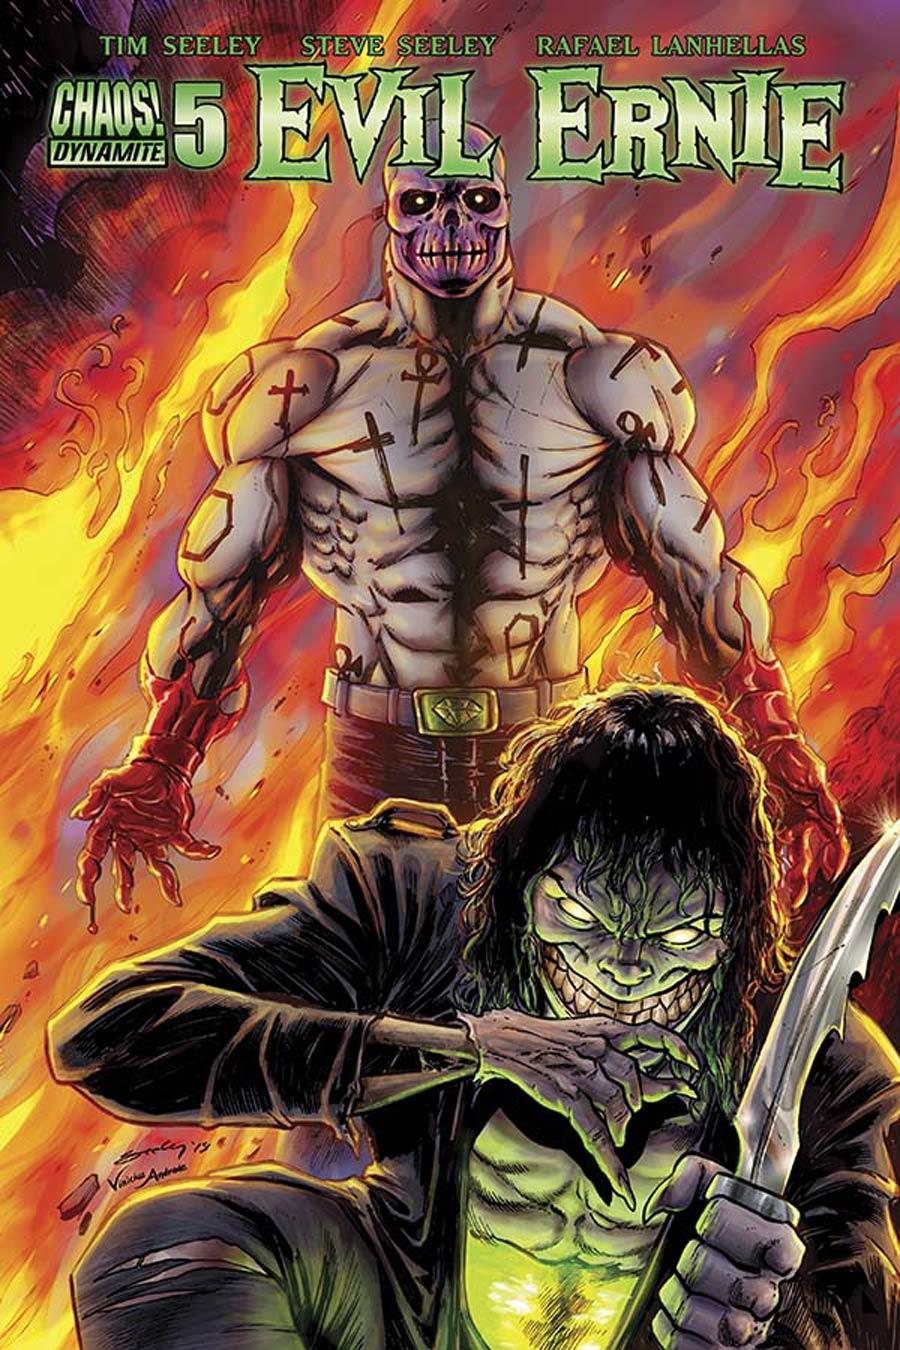 Evil Ernie Vol 4 #5 Cover A Regular Tim Seeley Cover